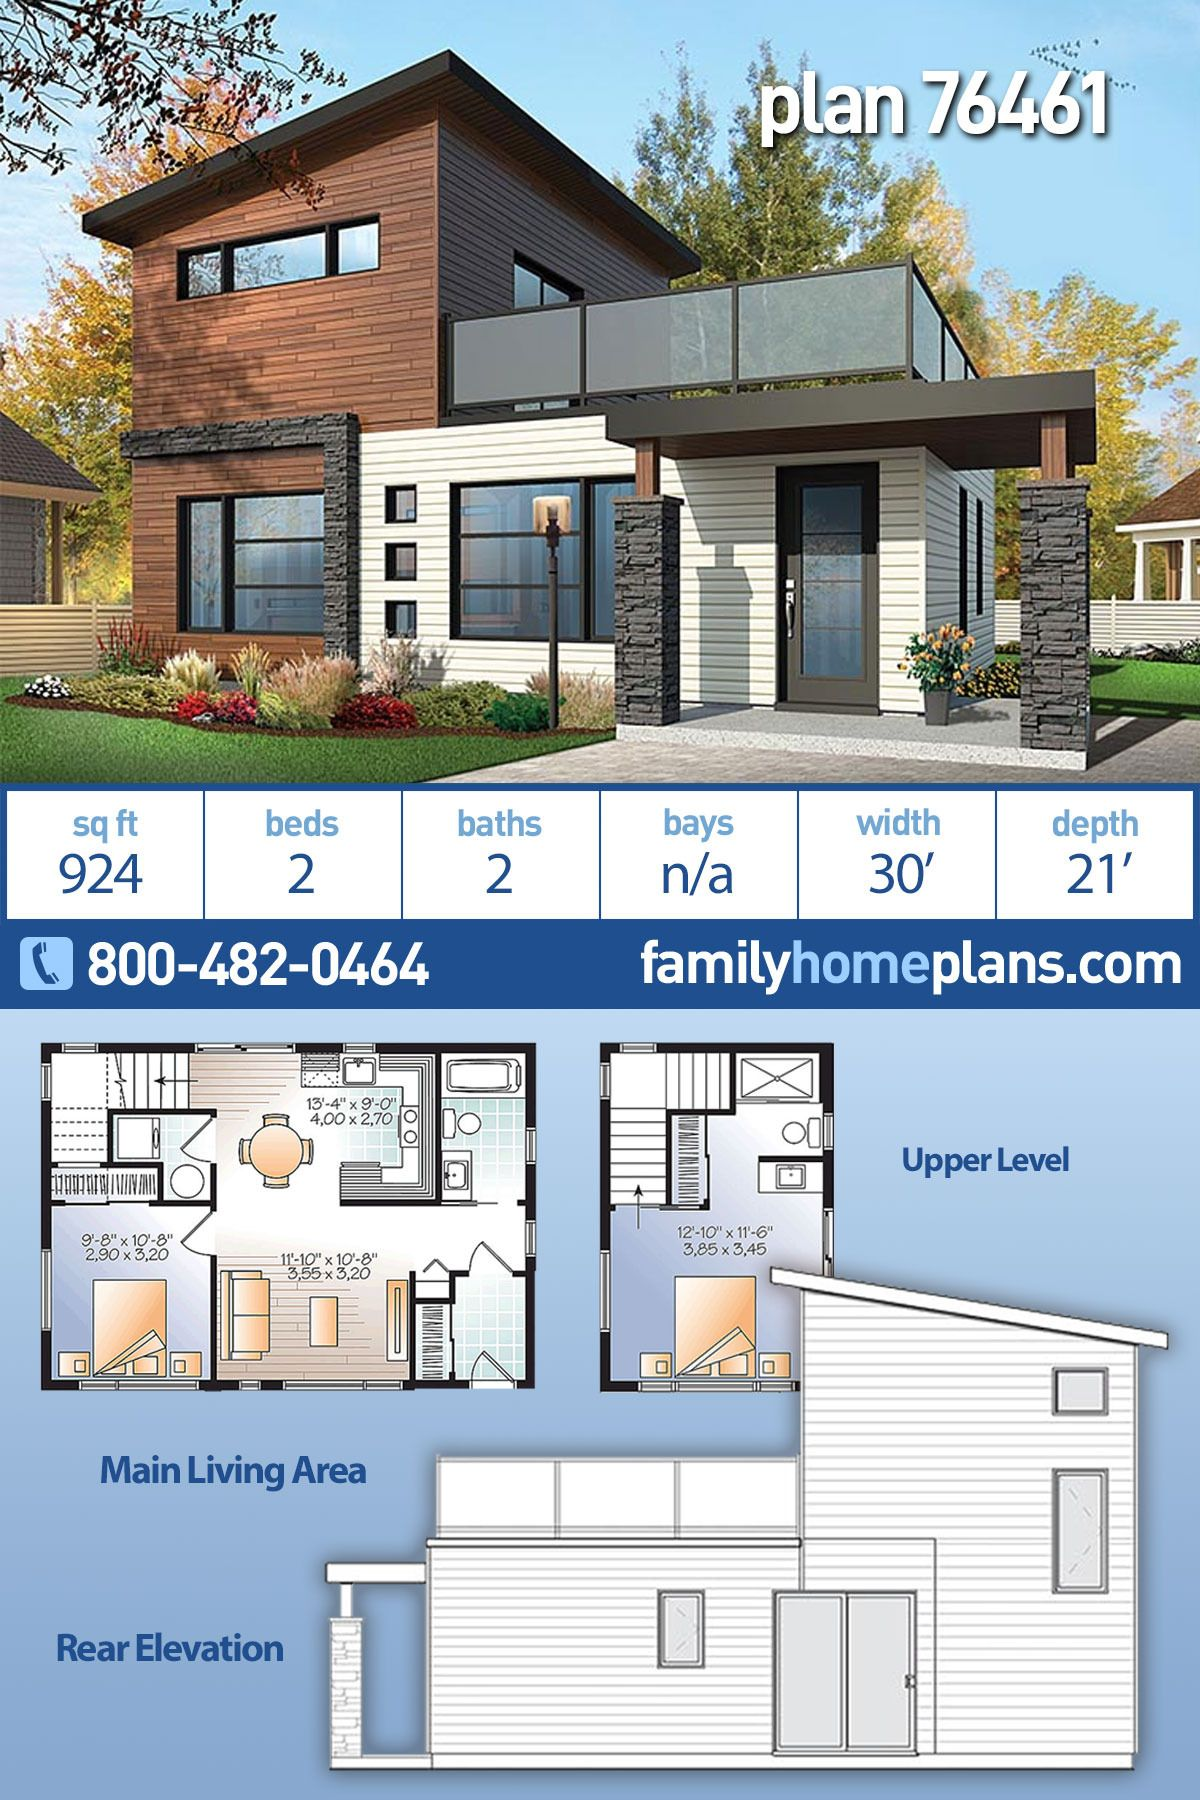 Contemporary House Plans For Sale 2020 Arsitektur Rumah Pedesaan Arsitektur Rumah